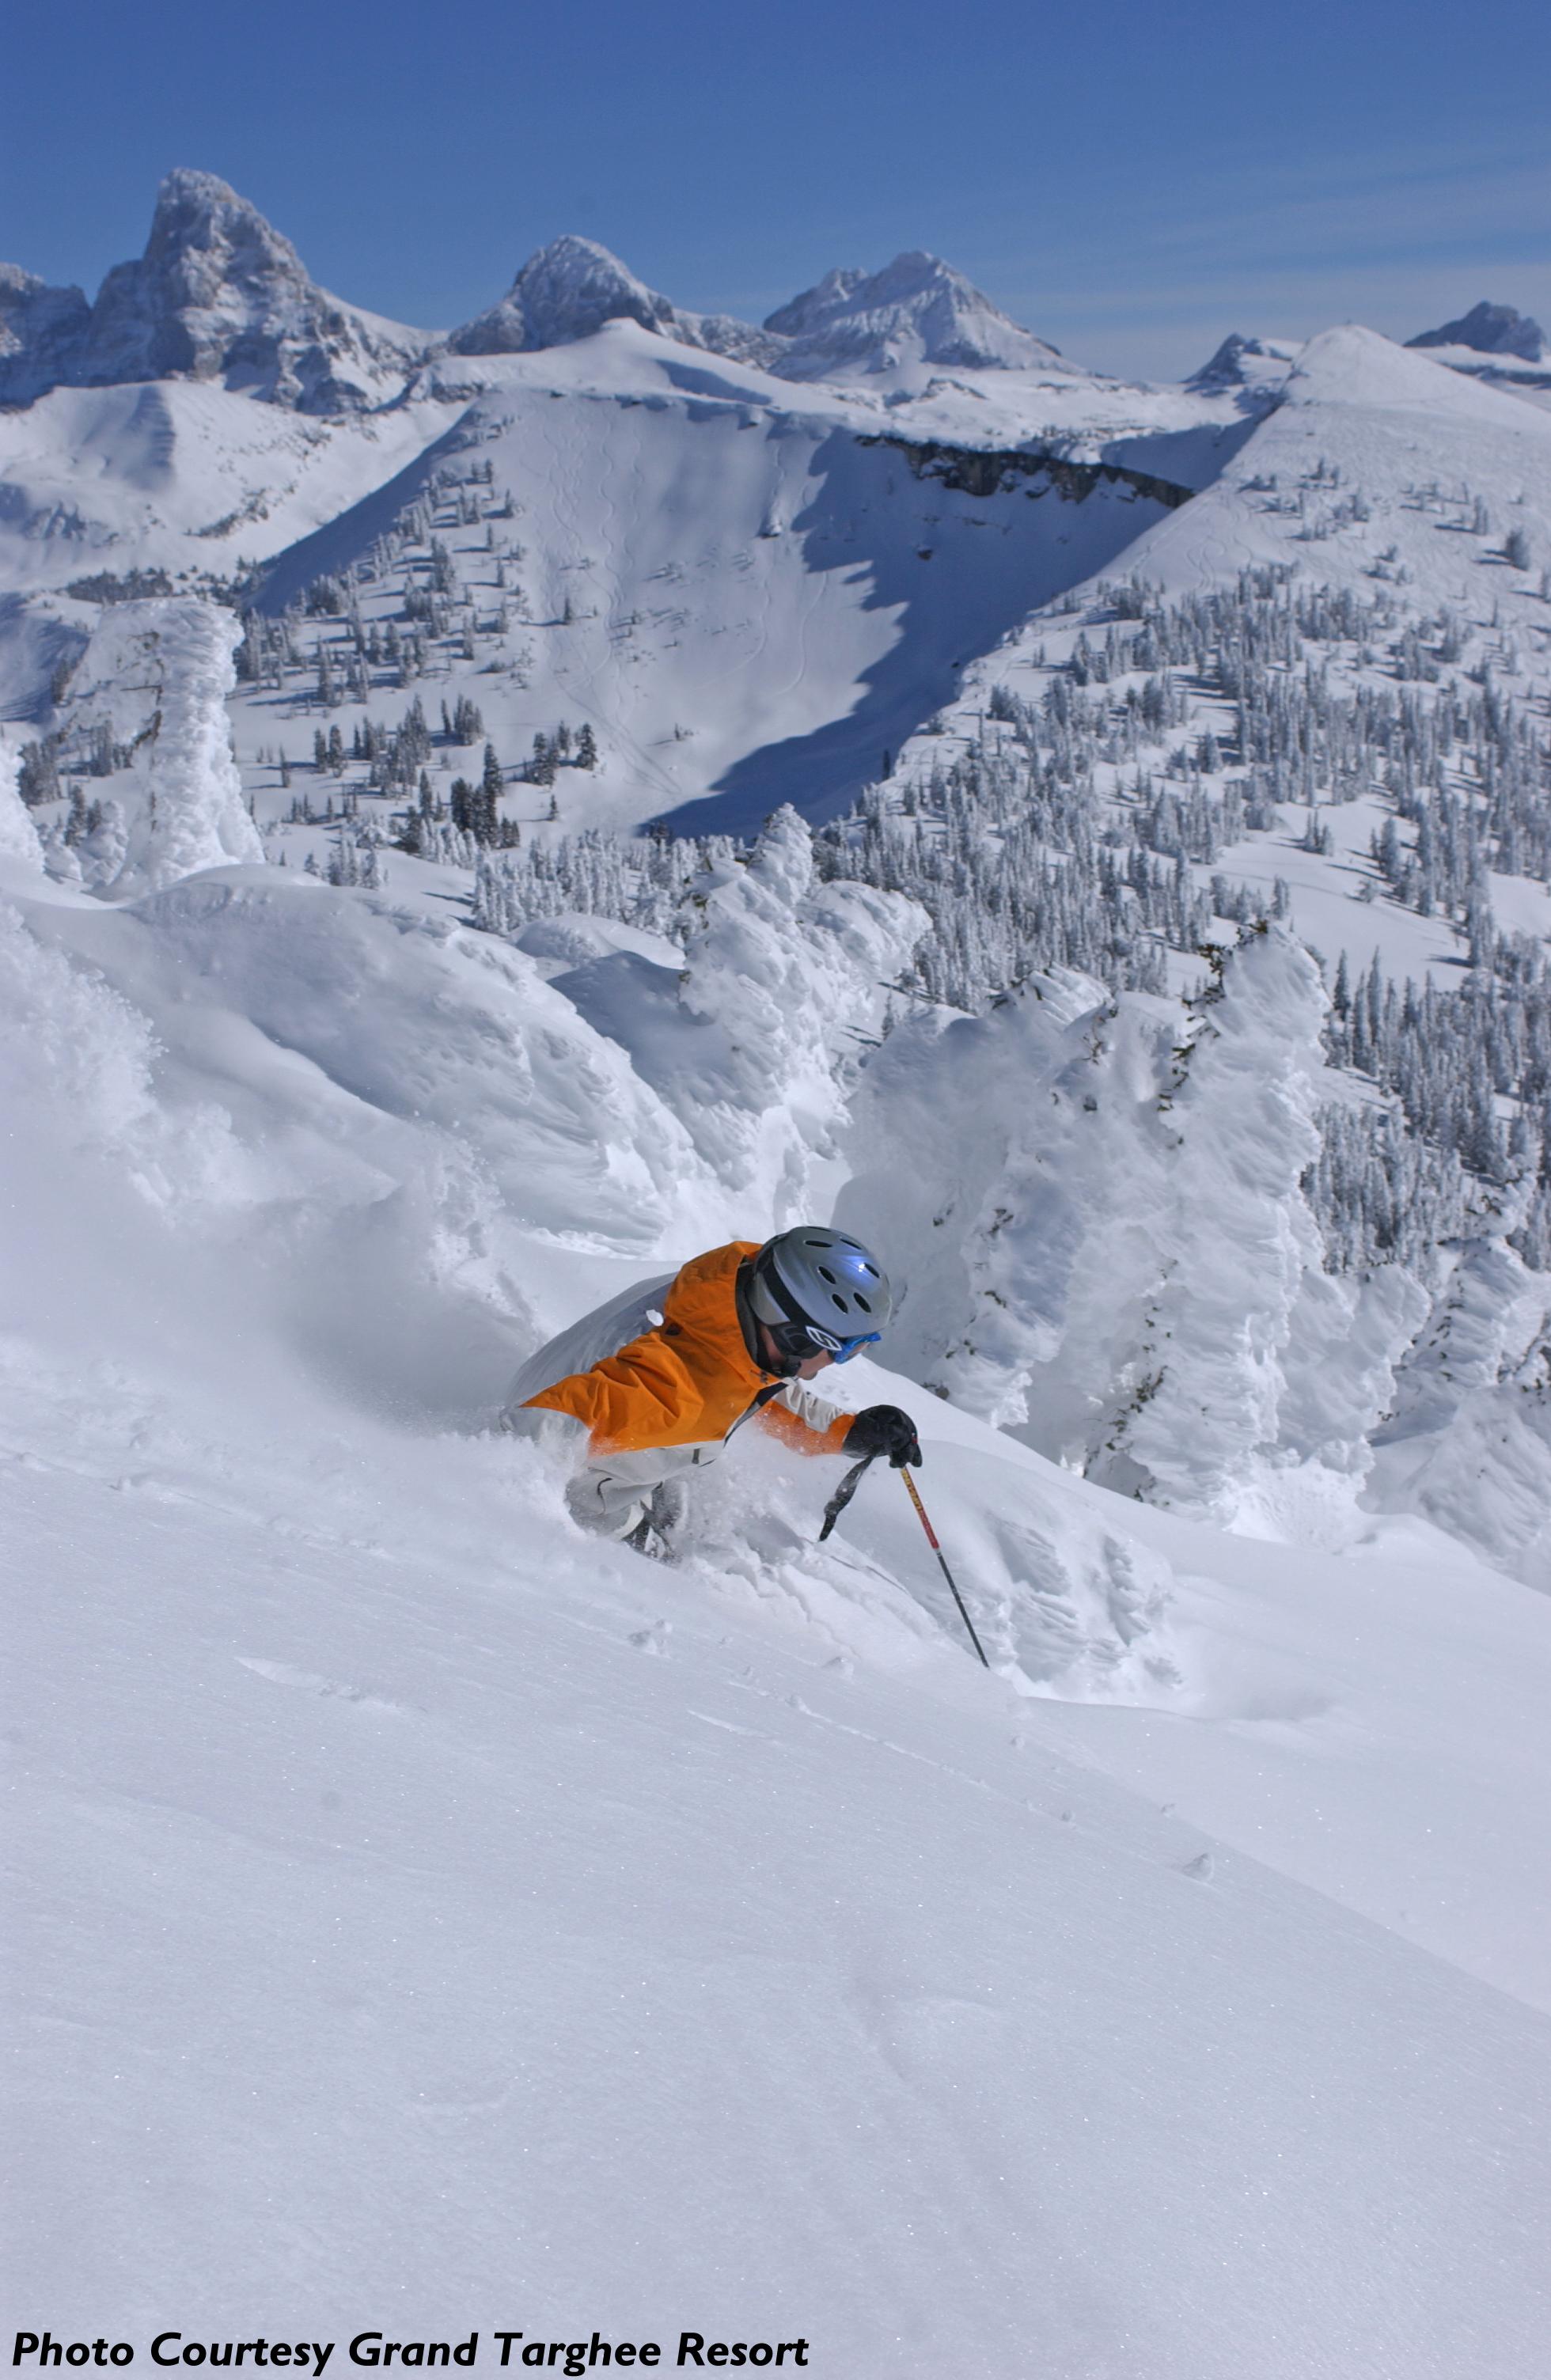 Why My Family Loves Skiing At Grand Targhee Wyoming The Brave - Grand targhee resort